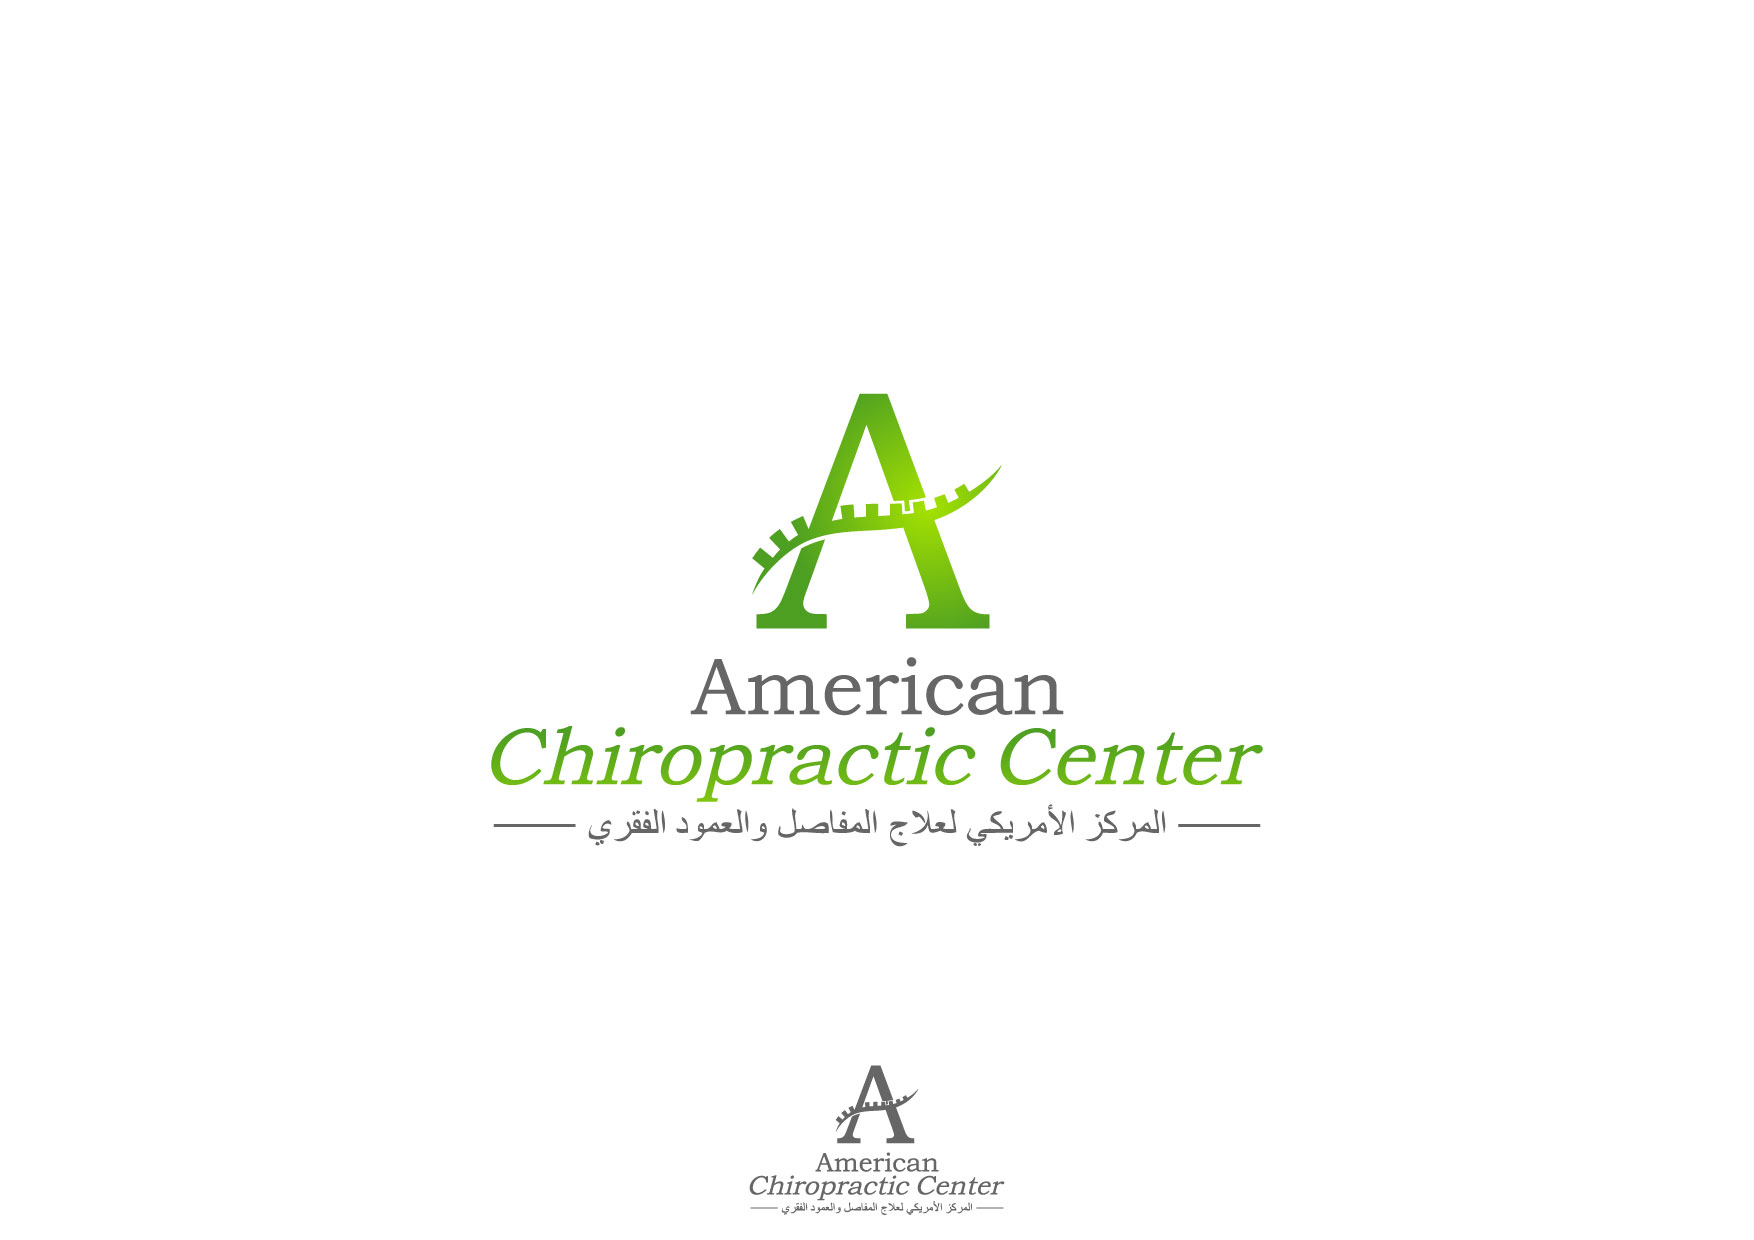 Logo Design by Nurgalih Destianto - Entry No. 102 in the Logo Design Contest Logo Design for American Chiropractic Center.